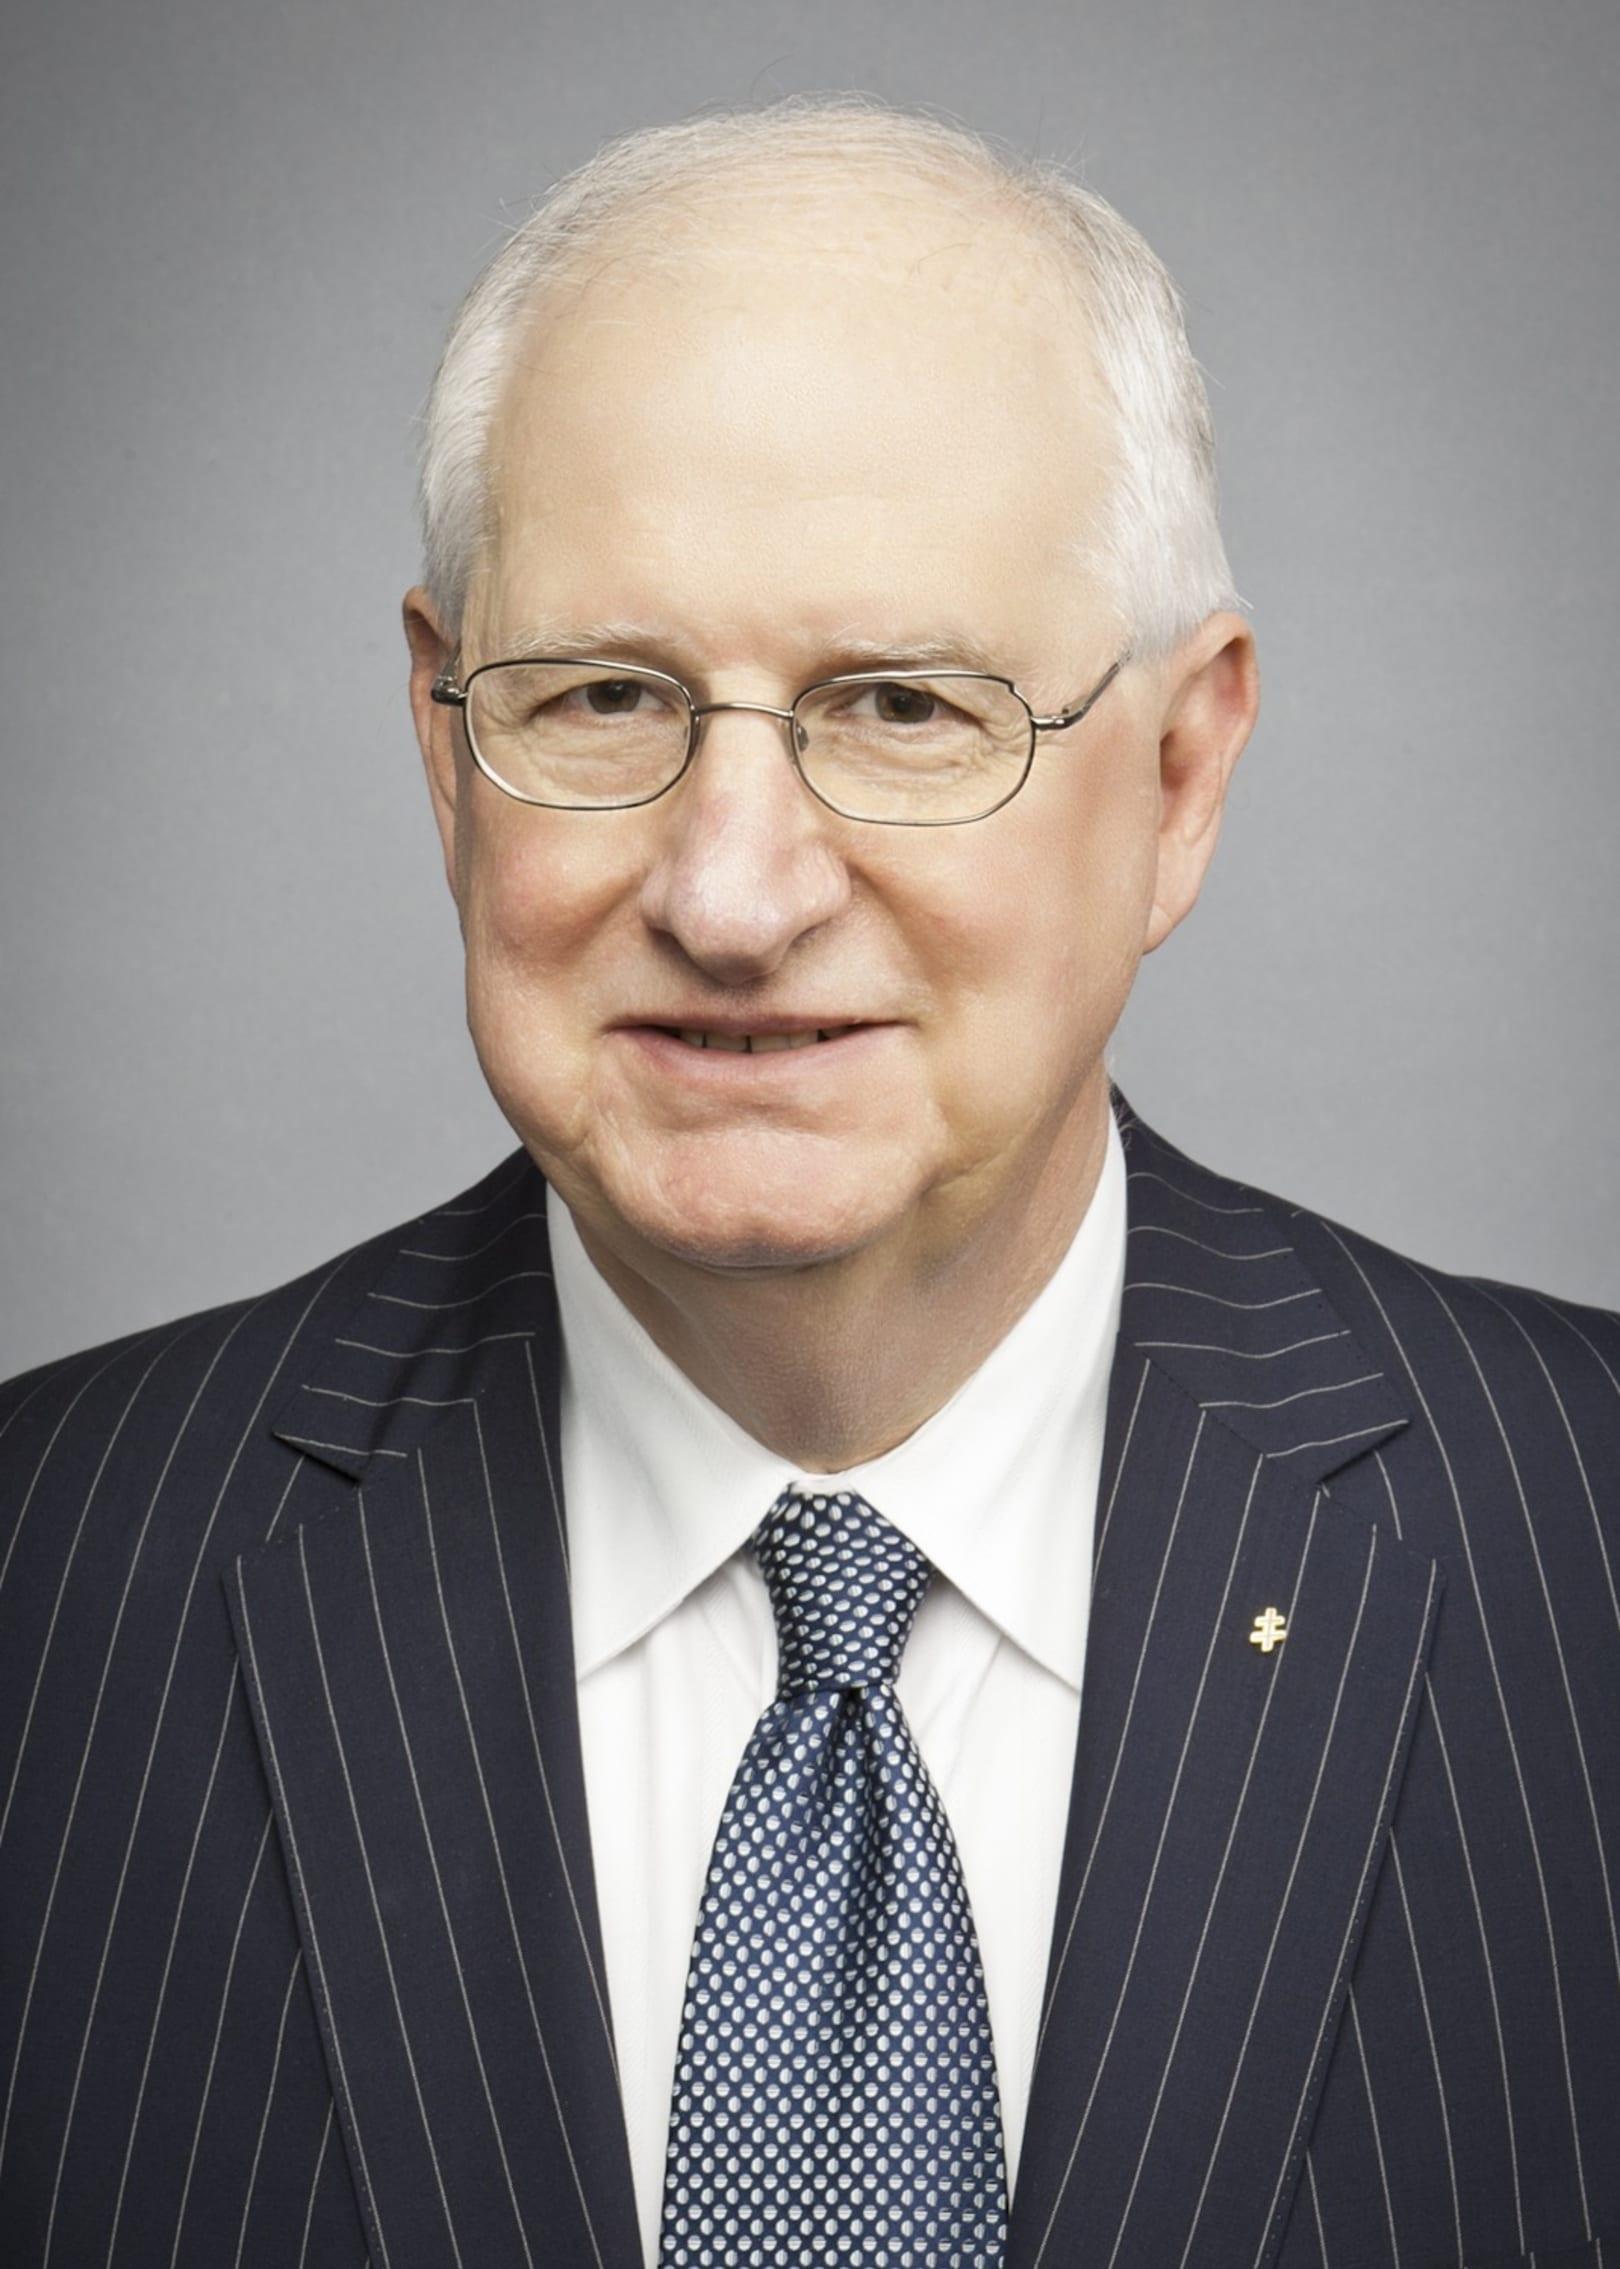 Ronald Skaggs, FAIA